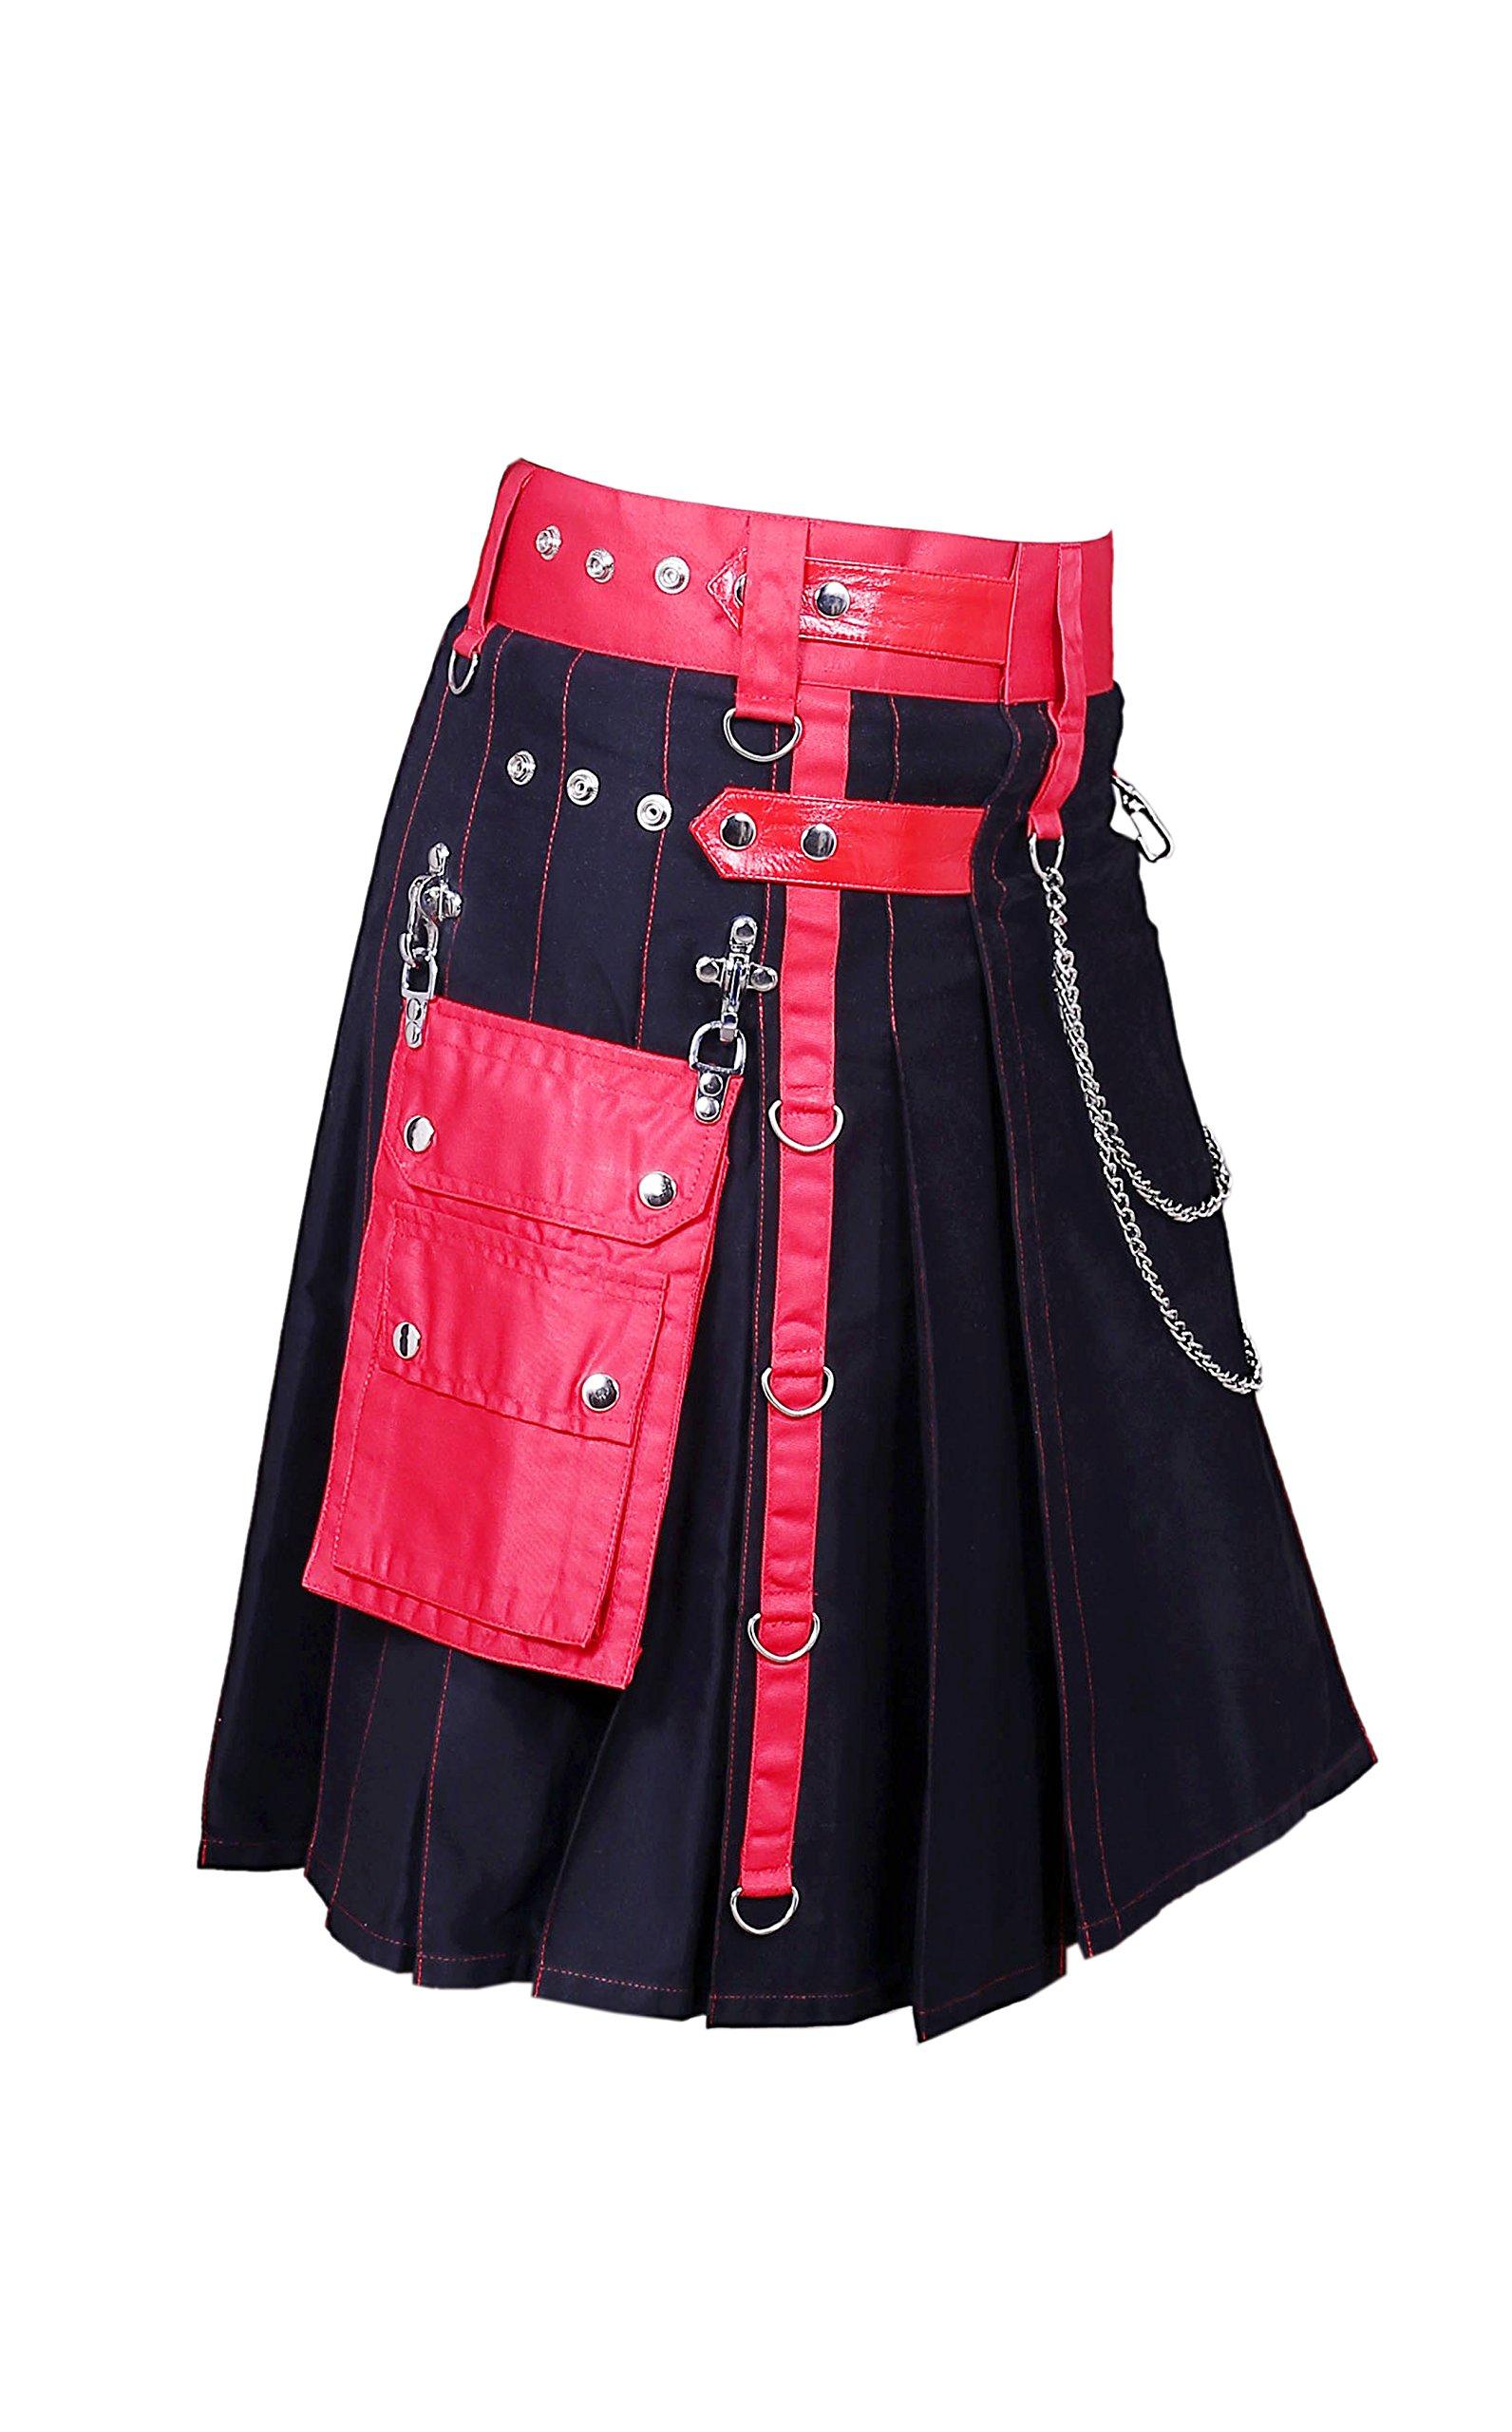 Black & Red Fashion Utility Kilt (Belly Button Measurements 42)